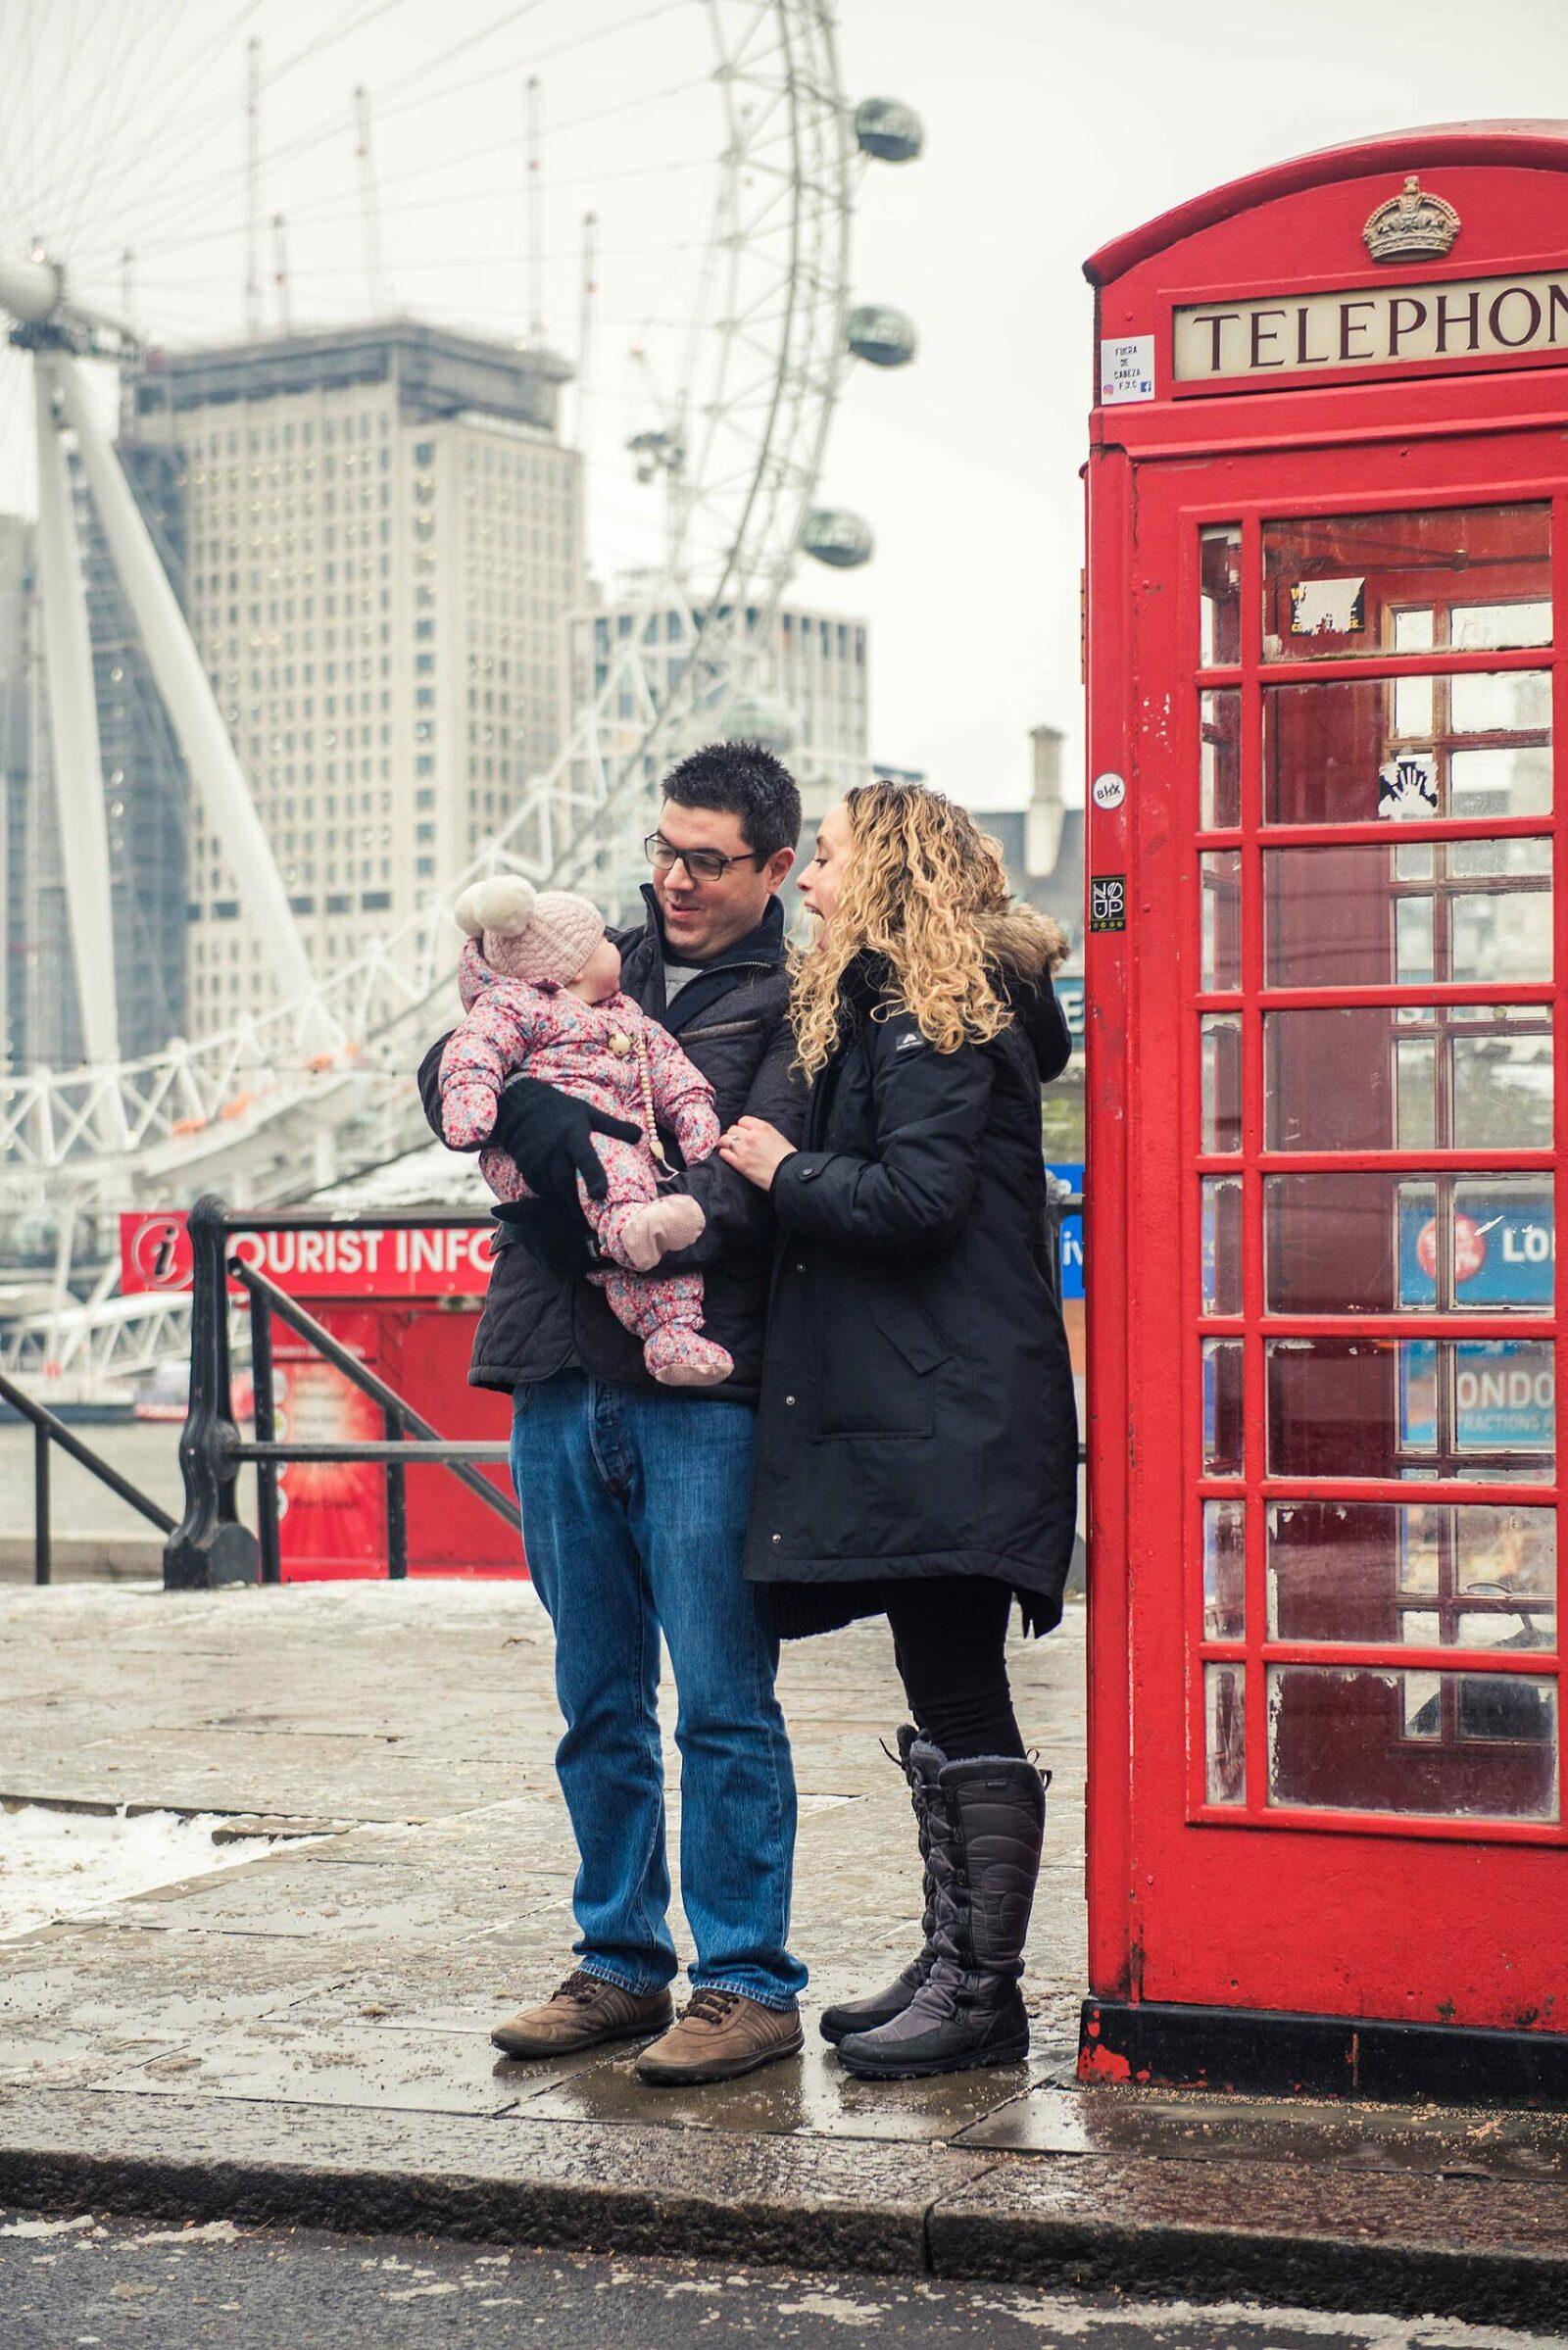 London Vacation Photo Shoot